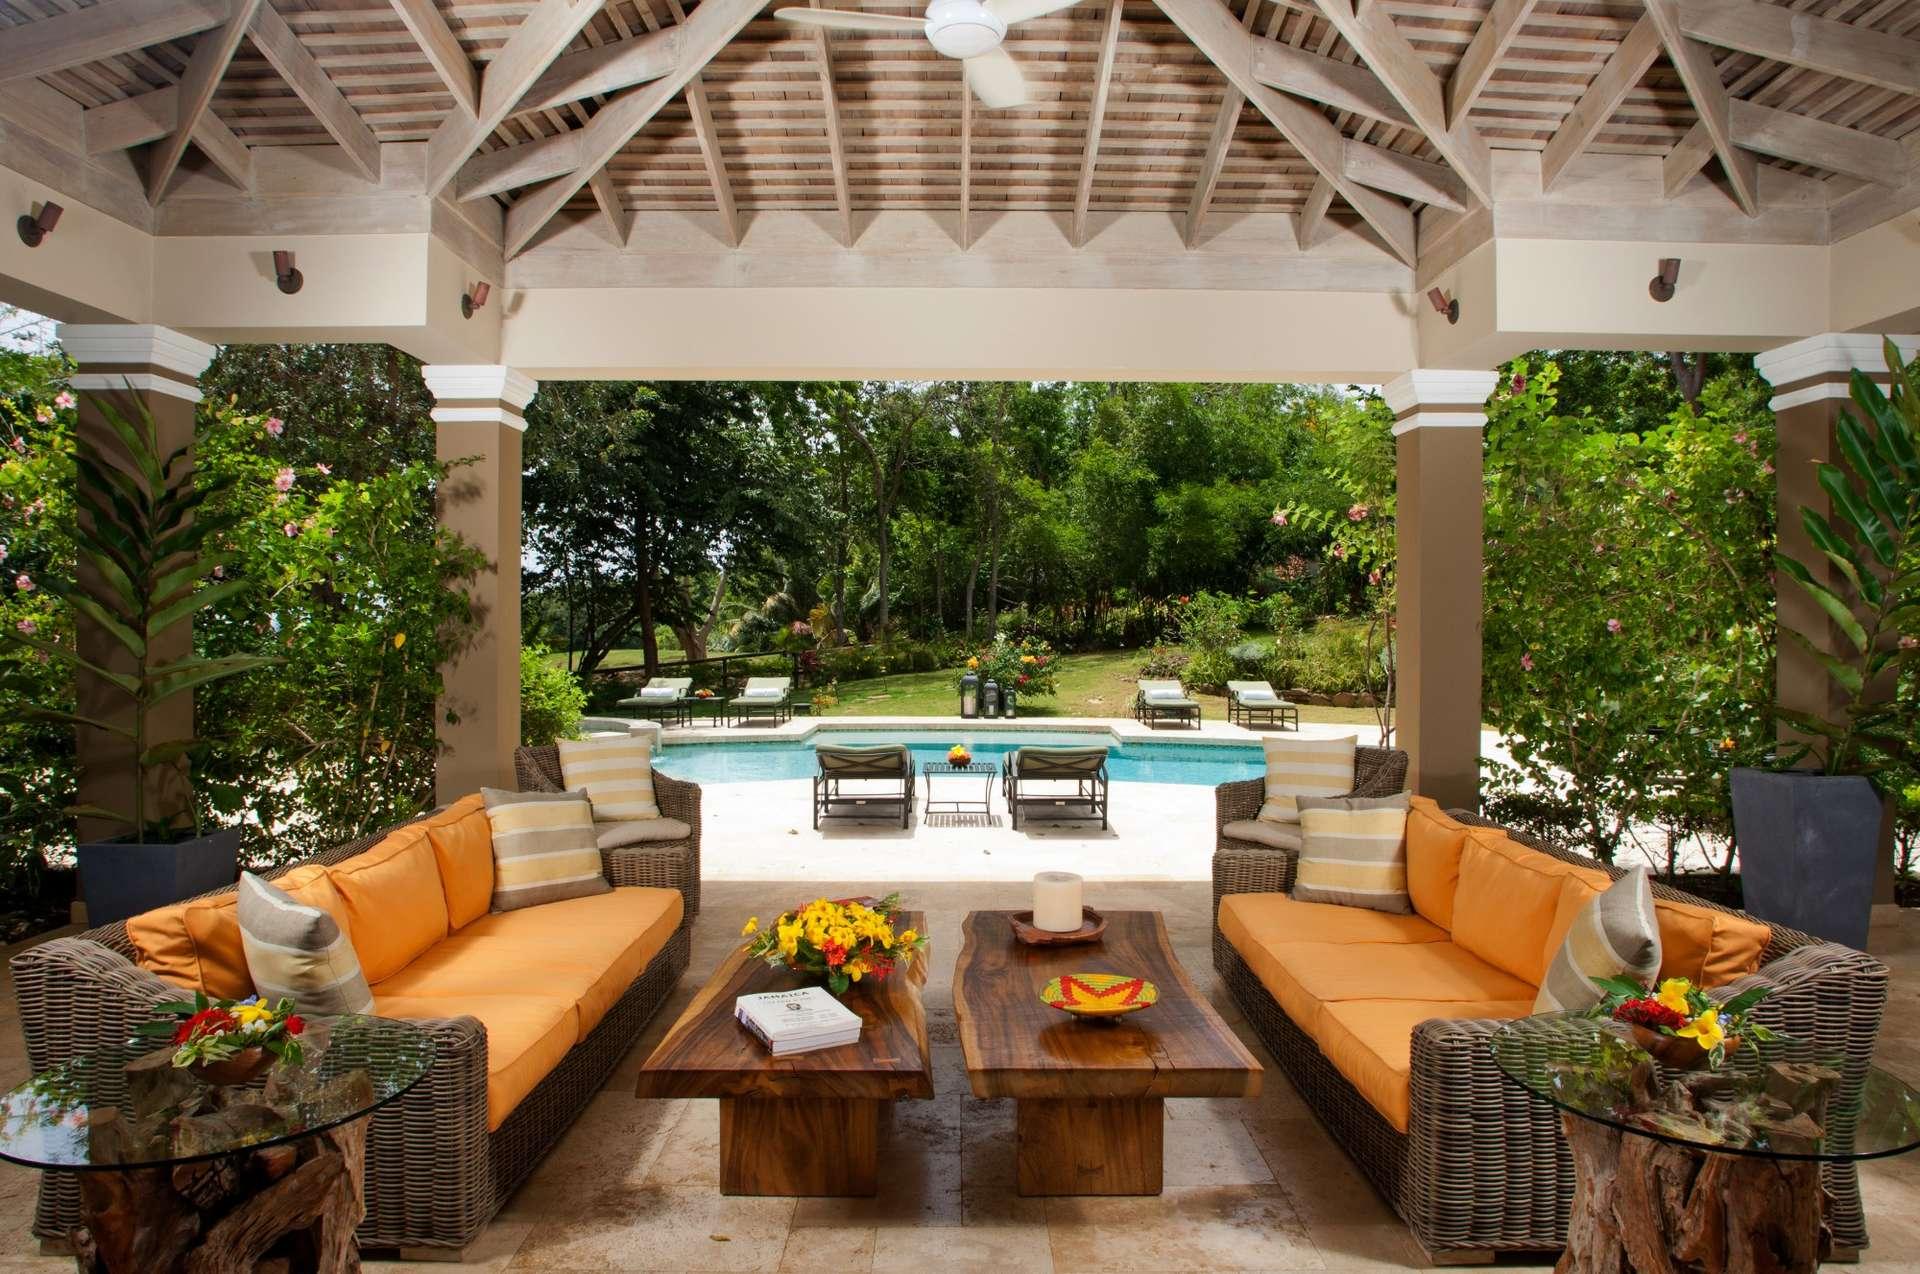 Luxury villa rentals caribbean - Jamaica - Montego bay - Tek Time - Image 1/17